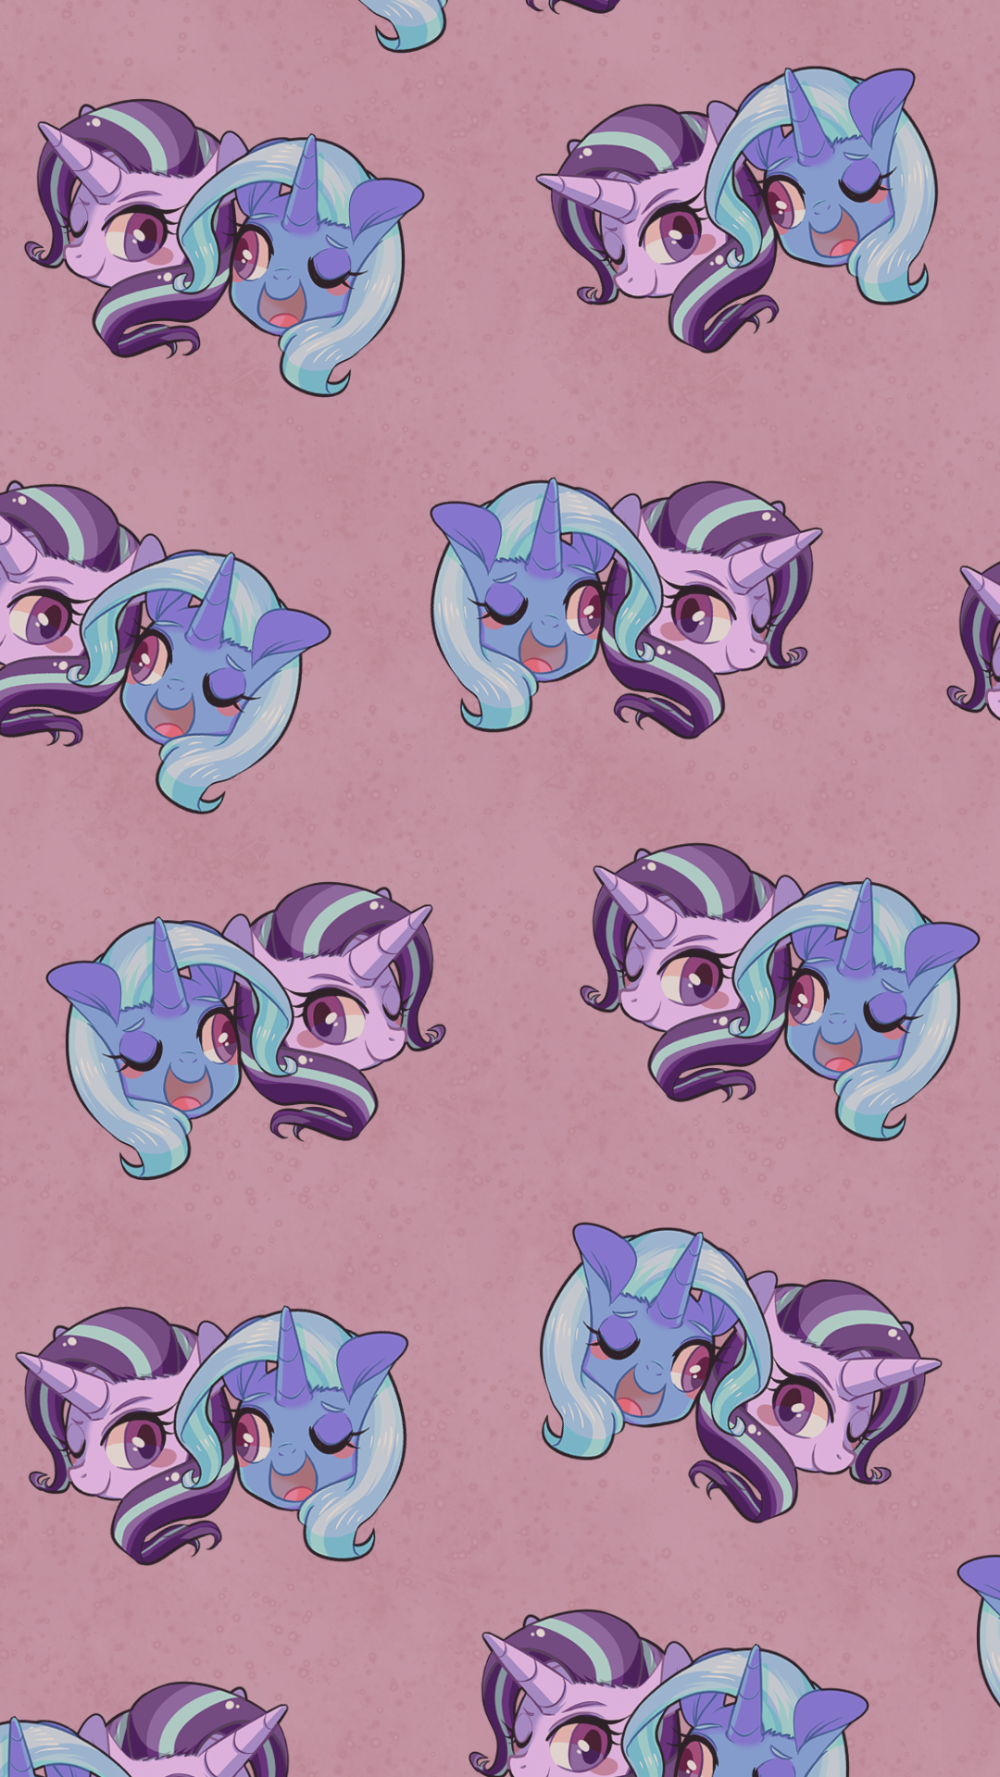 Pin De Ramsey En My Little Pony Friendship Is Magic Ponis Personajes